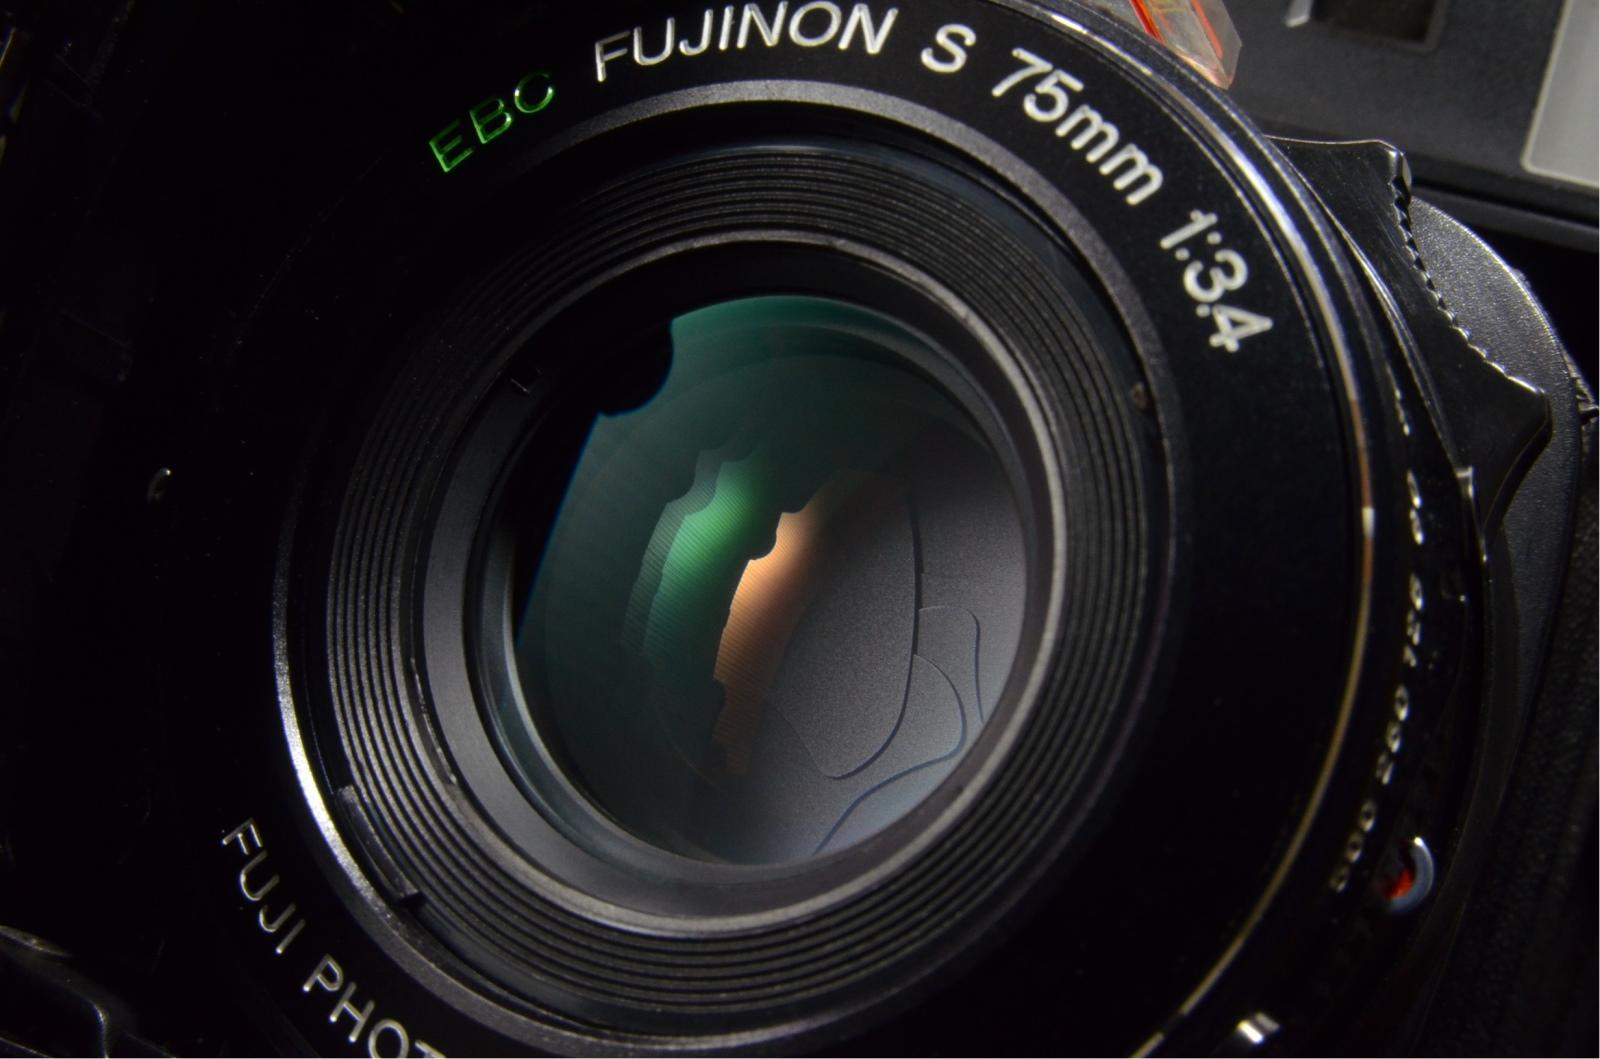 fujifilm fujica gs645 film camera 75mm f3.4 with lens hood from japan